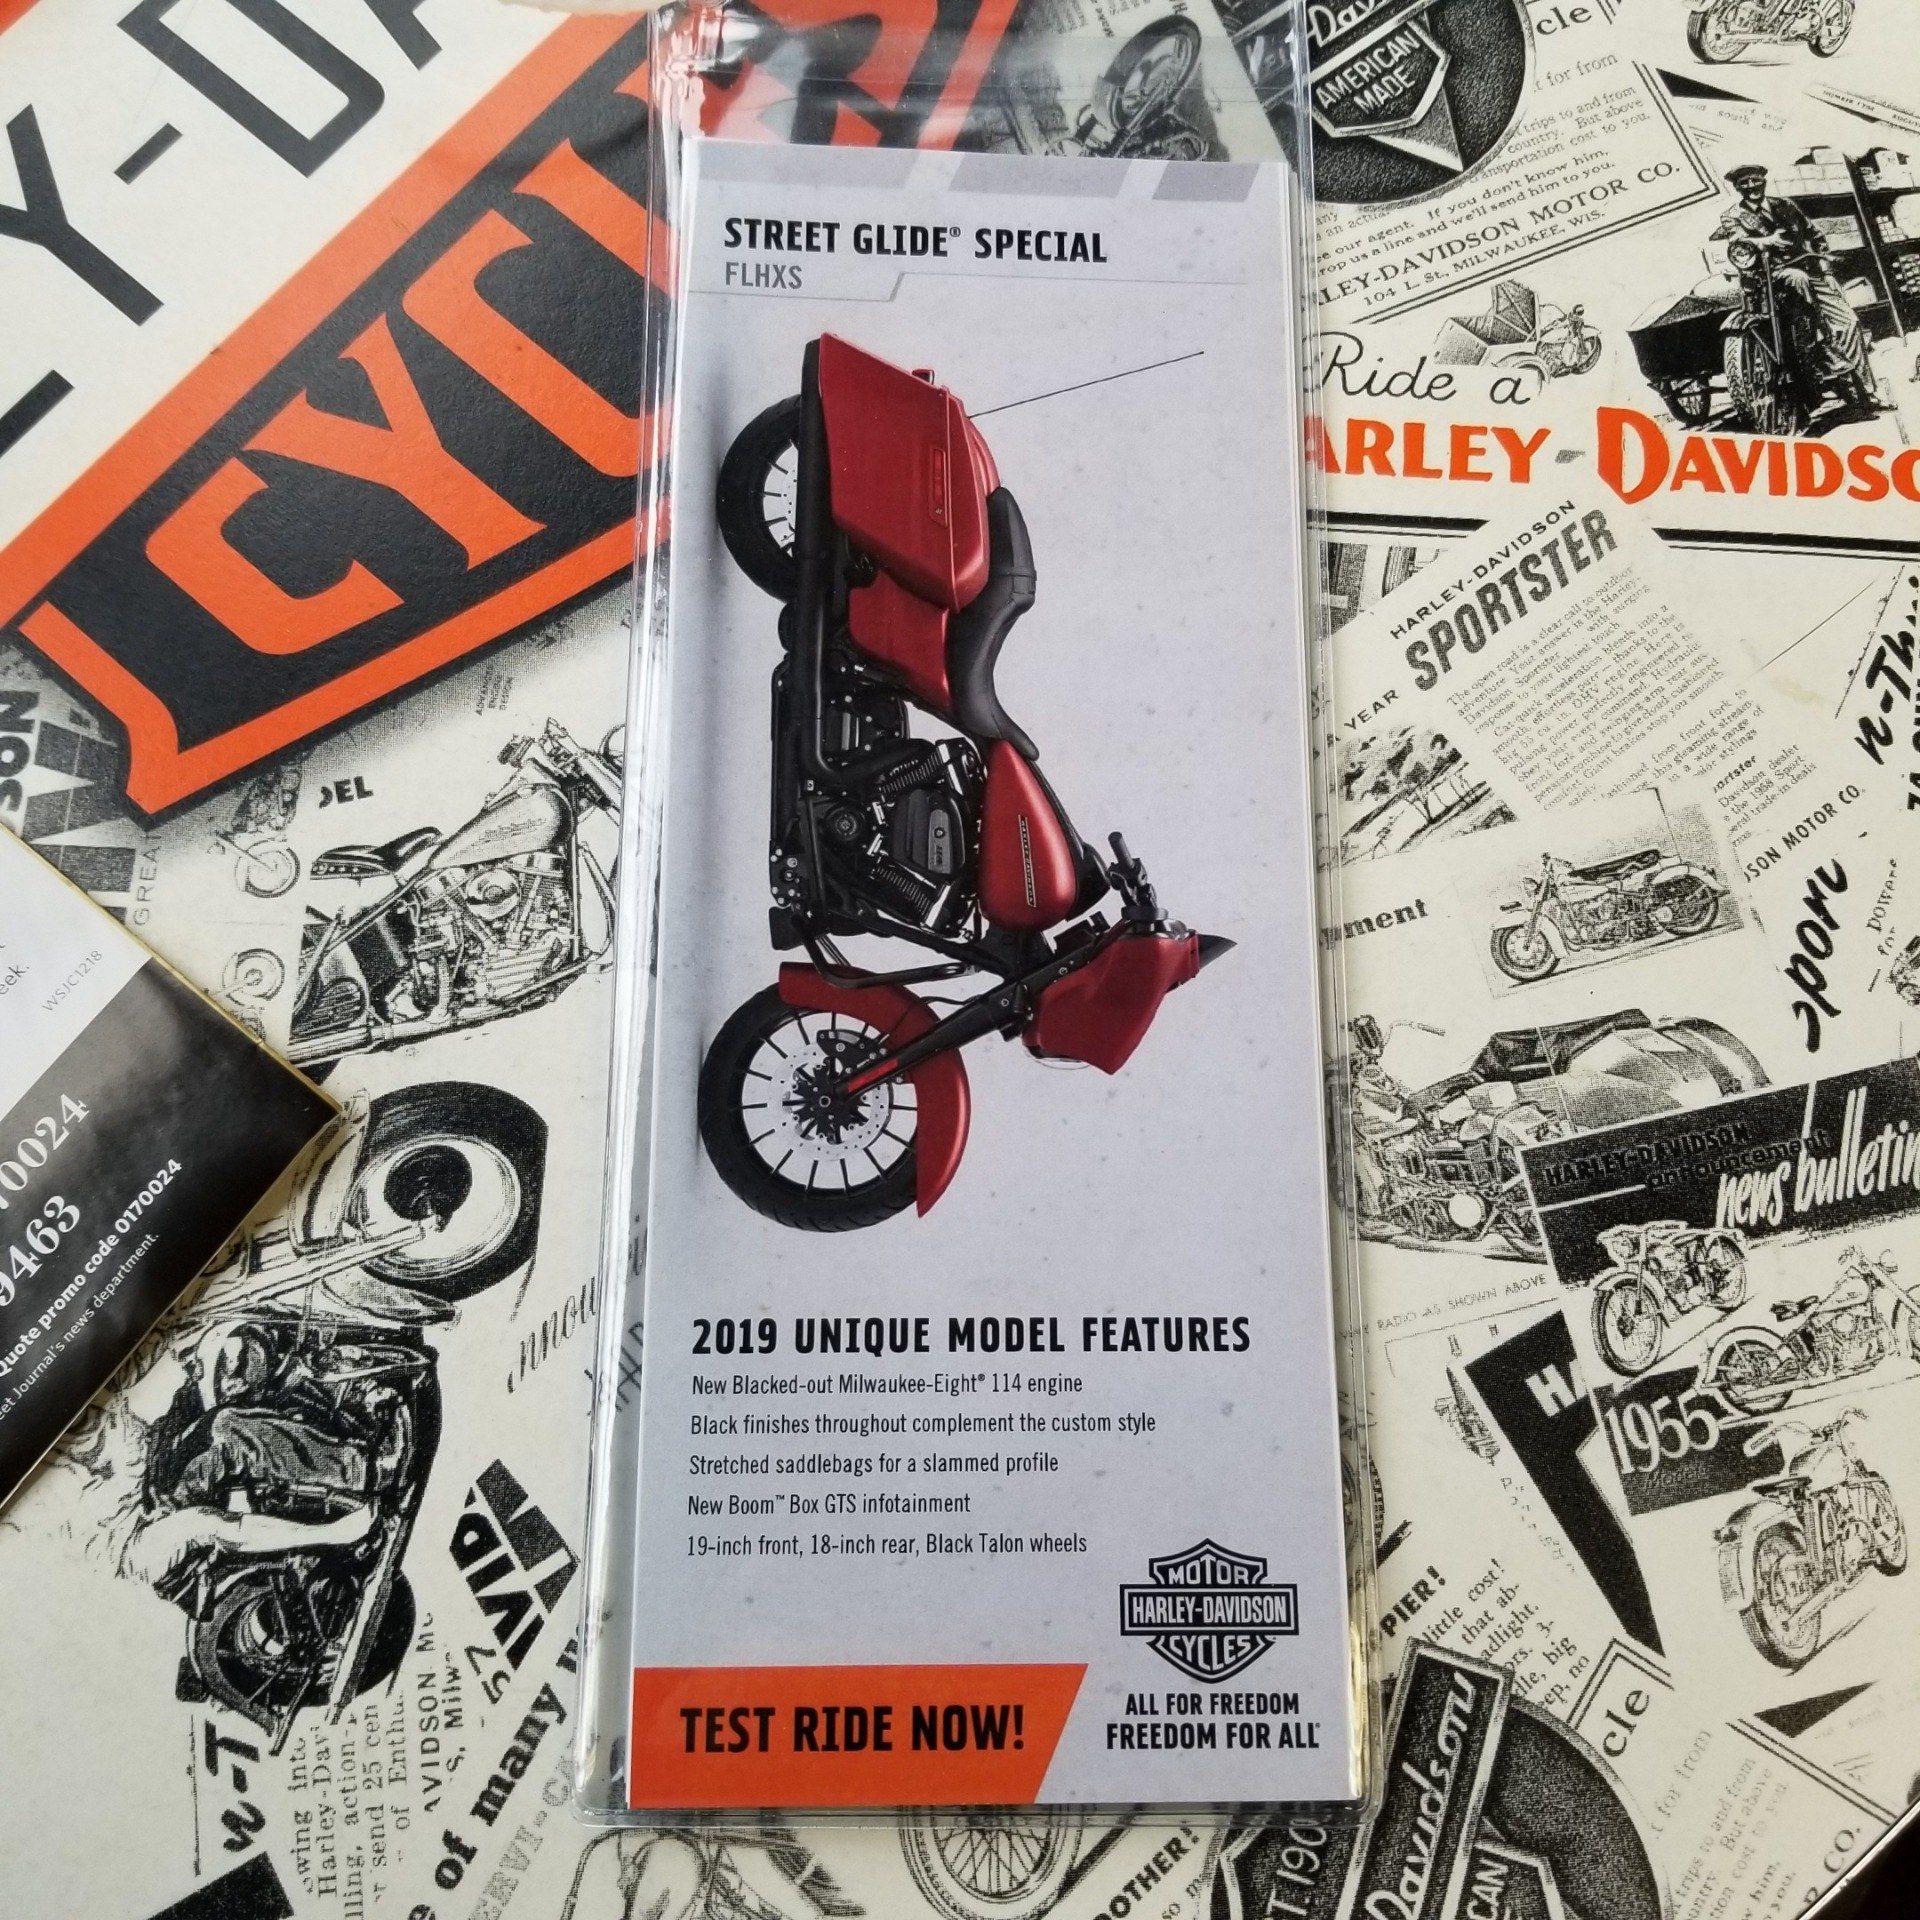 2019 Harley-Davidson Street Glide Special 9